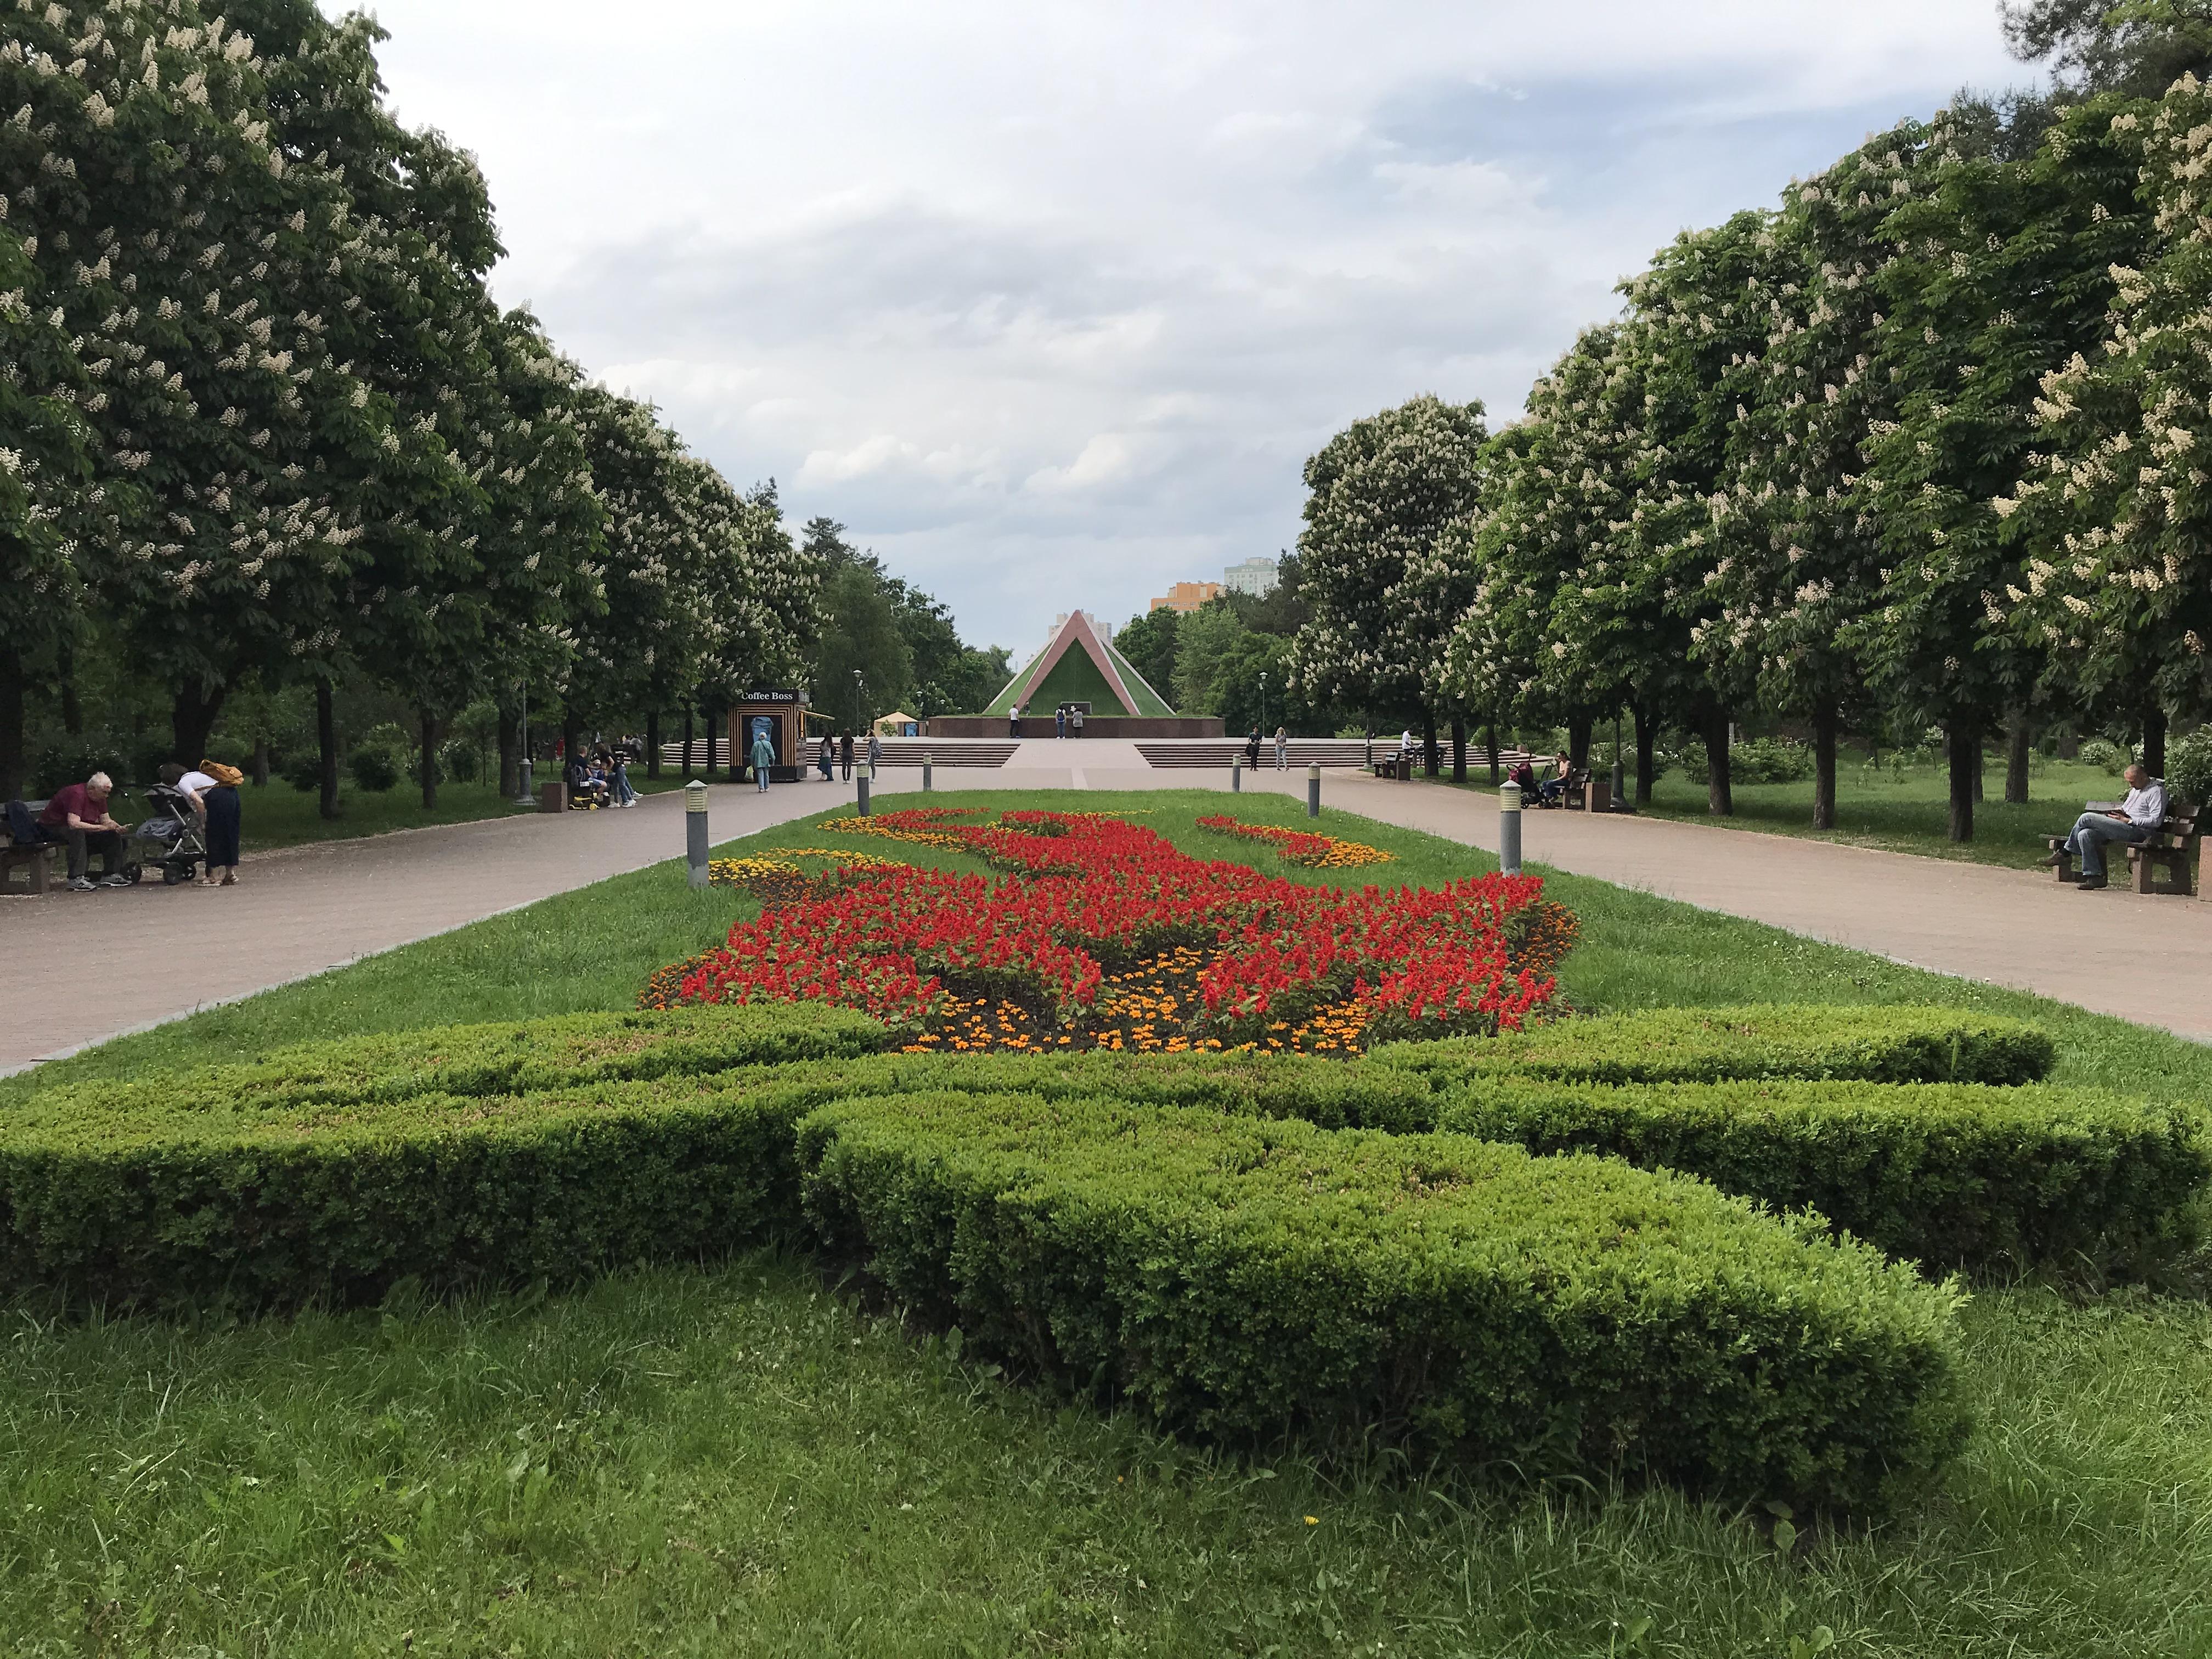 Minnespark